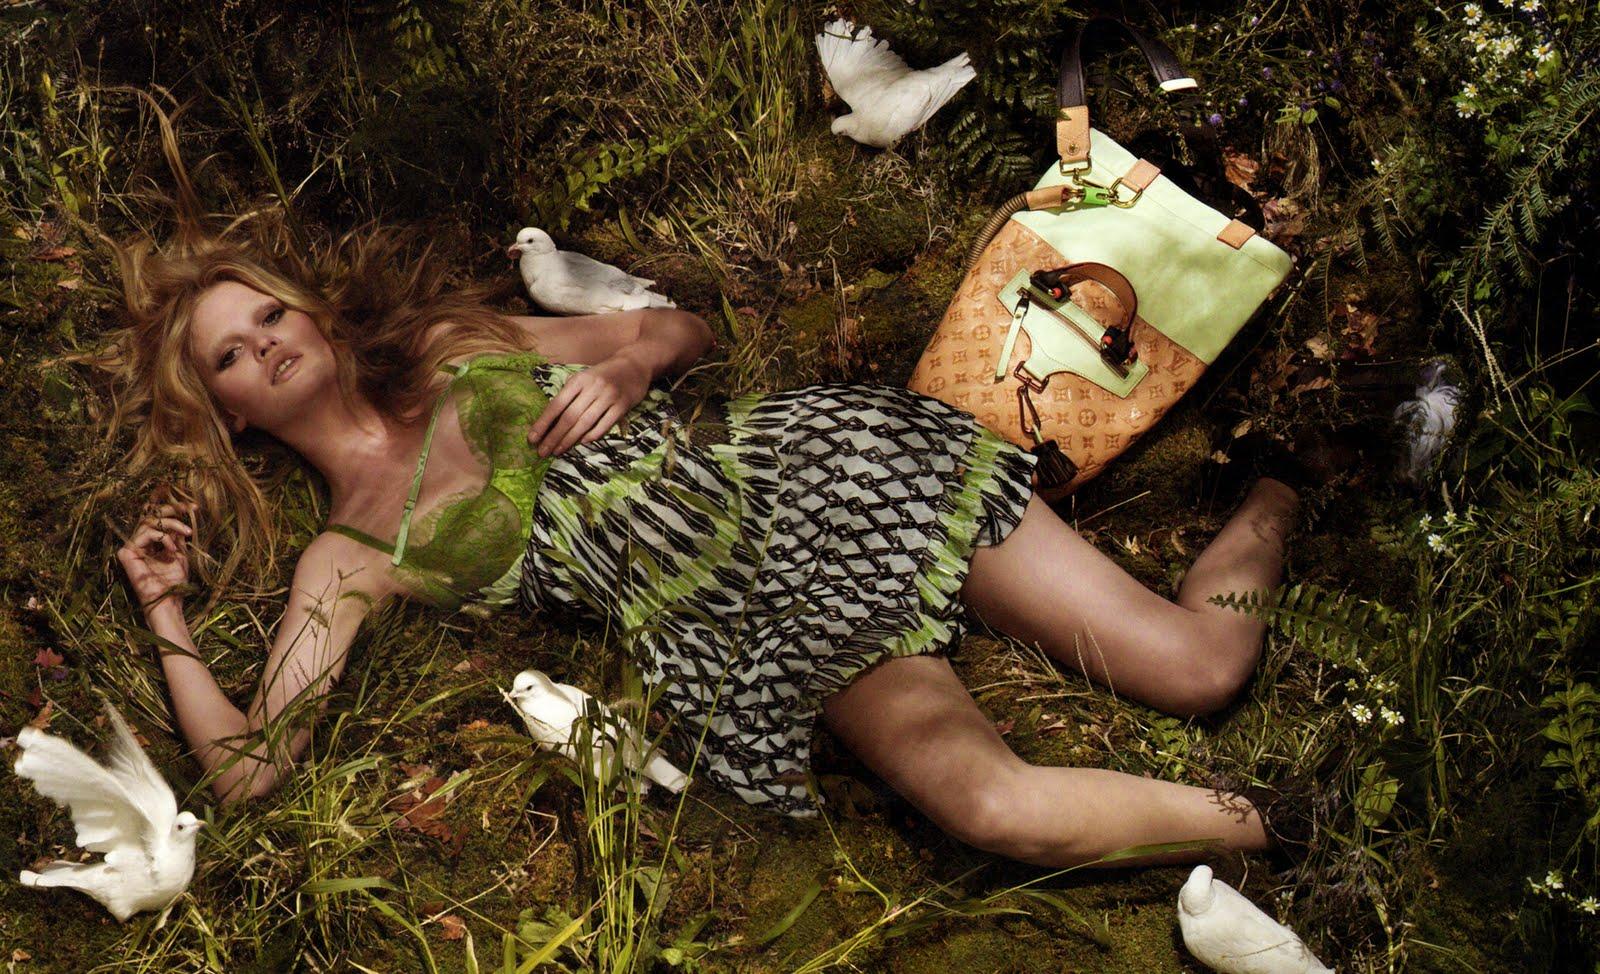 http://4.bp.blogspot.com/_Shzz_T0VihI/S_ar7dPm7JI/AAAAAAAABBU/DeNckx6yMRQ/s1600/Louis+Vuitton_Lara+Stone_SS2010+04Apr01.jpg